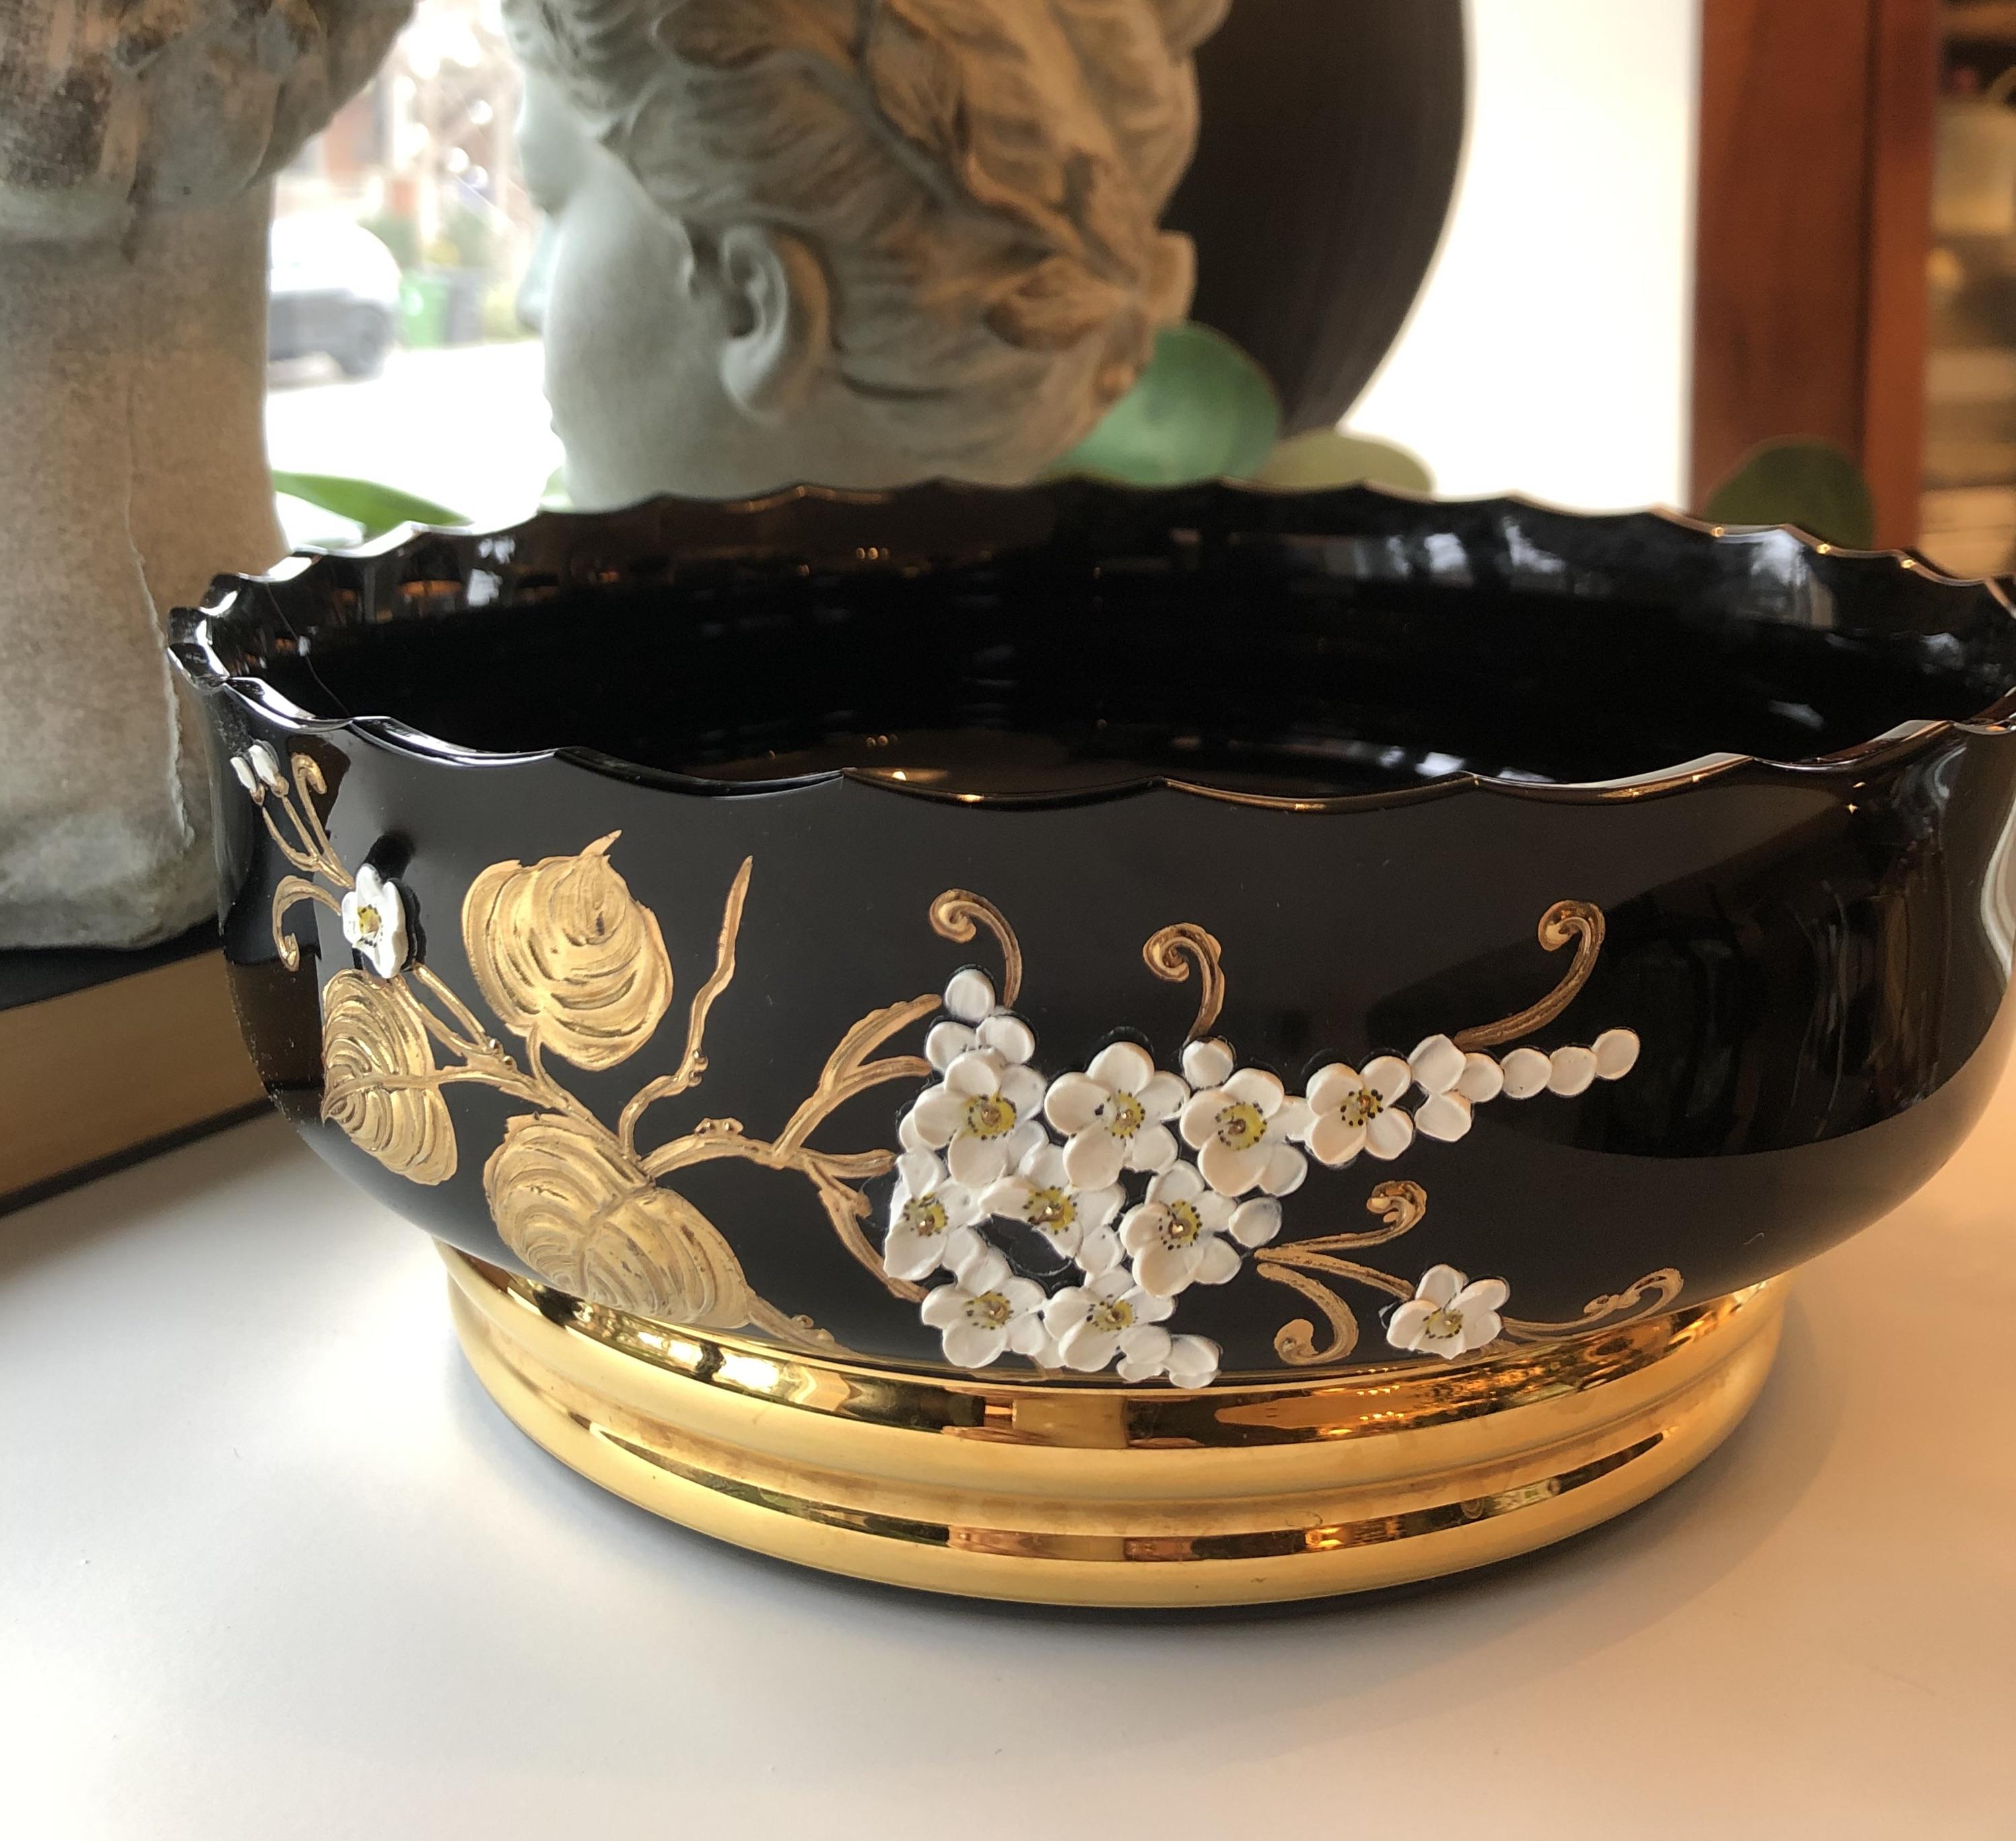 Antique Black Amethyst Bowl